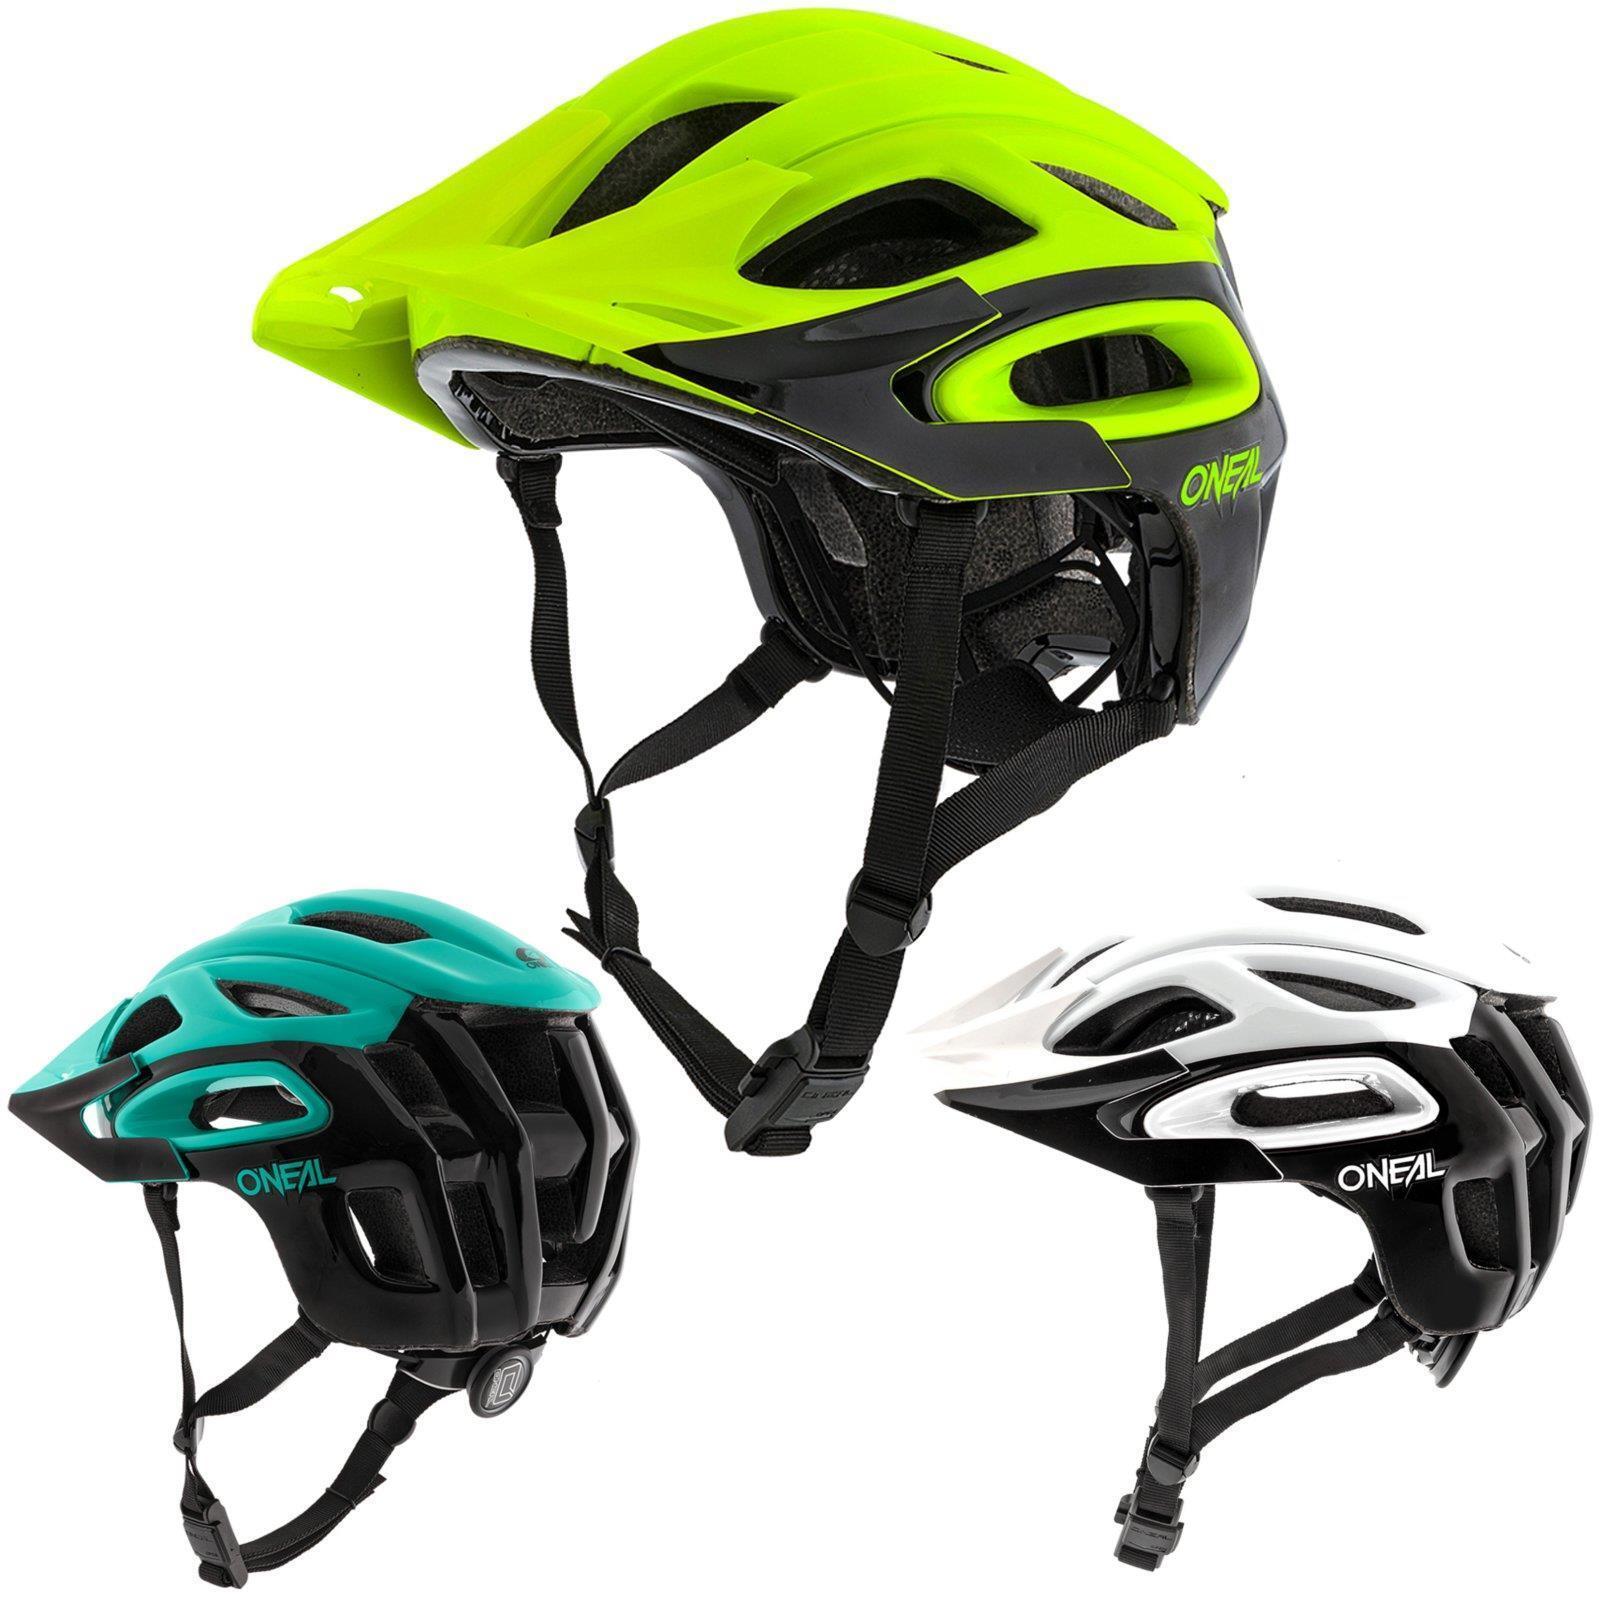 ONEAL Orbiter II Solid Fahrrad All Mountain Fahrrad Helmet MTB Trekking Enduro Trail